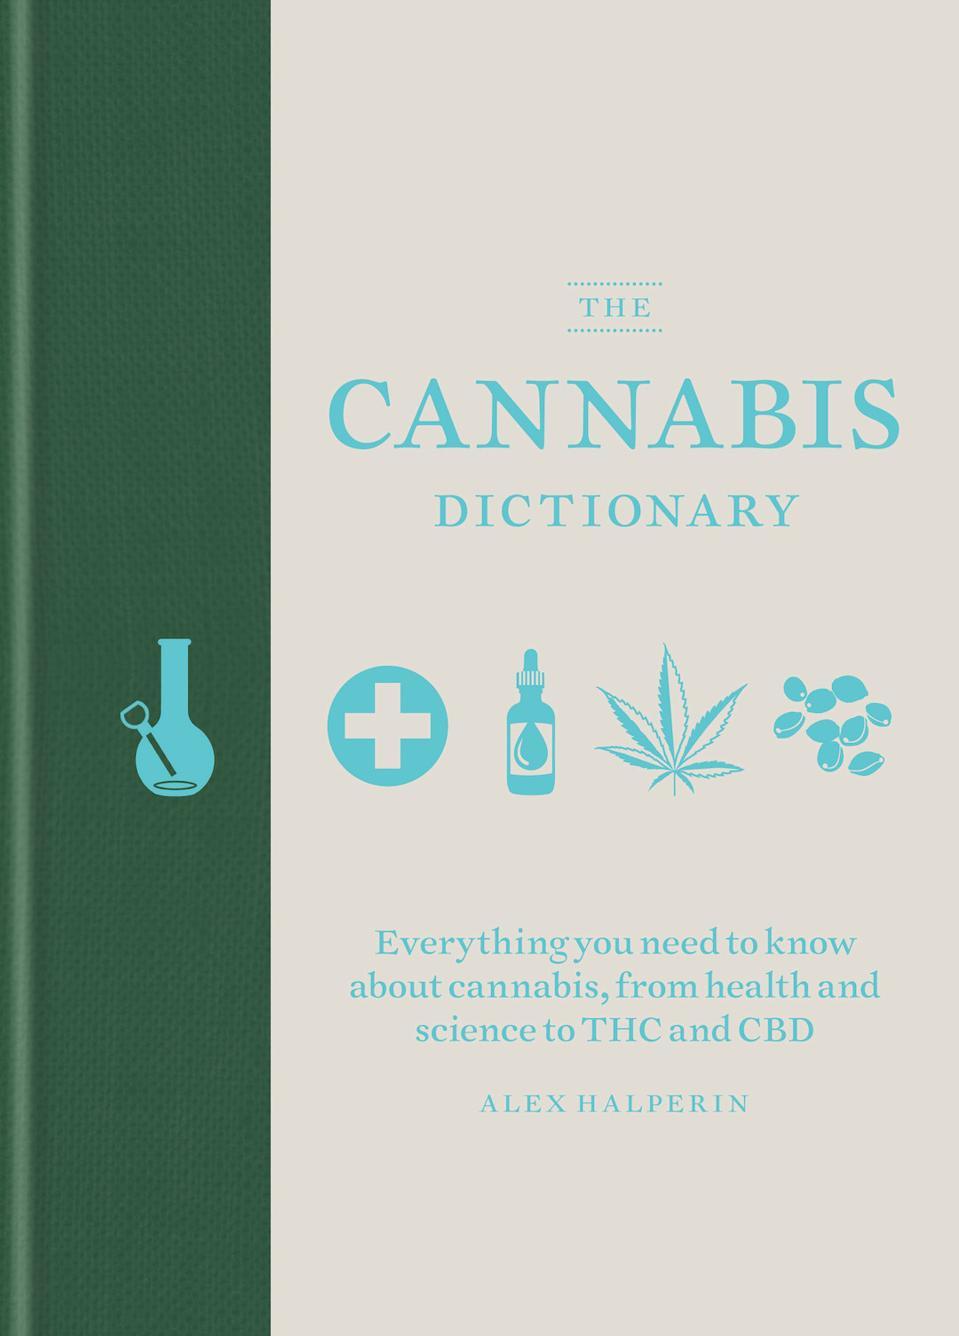 The Cannabis Dictionary, Alex Halperin, cannabis books, marijuana books